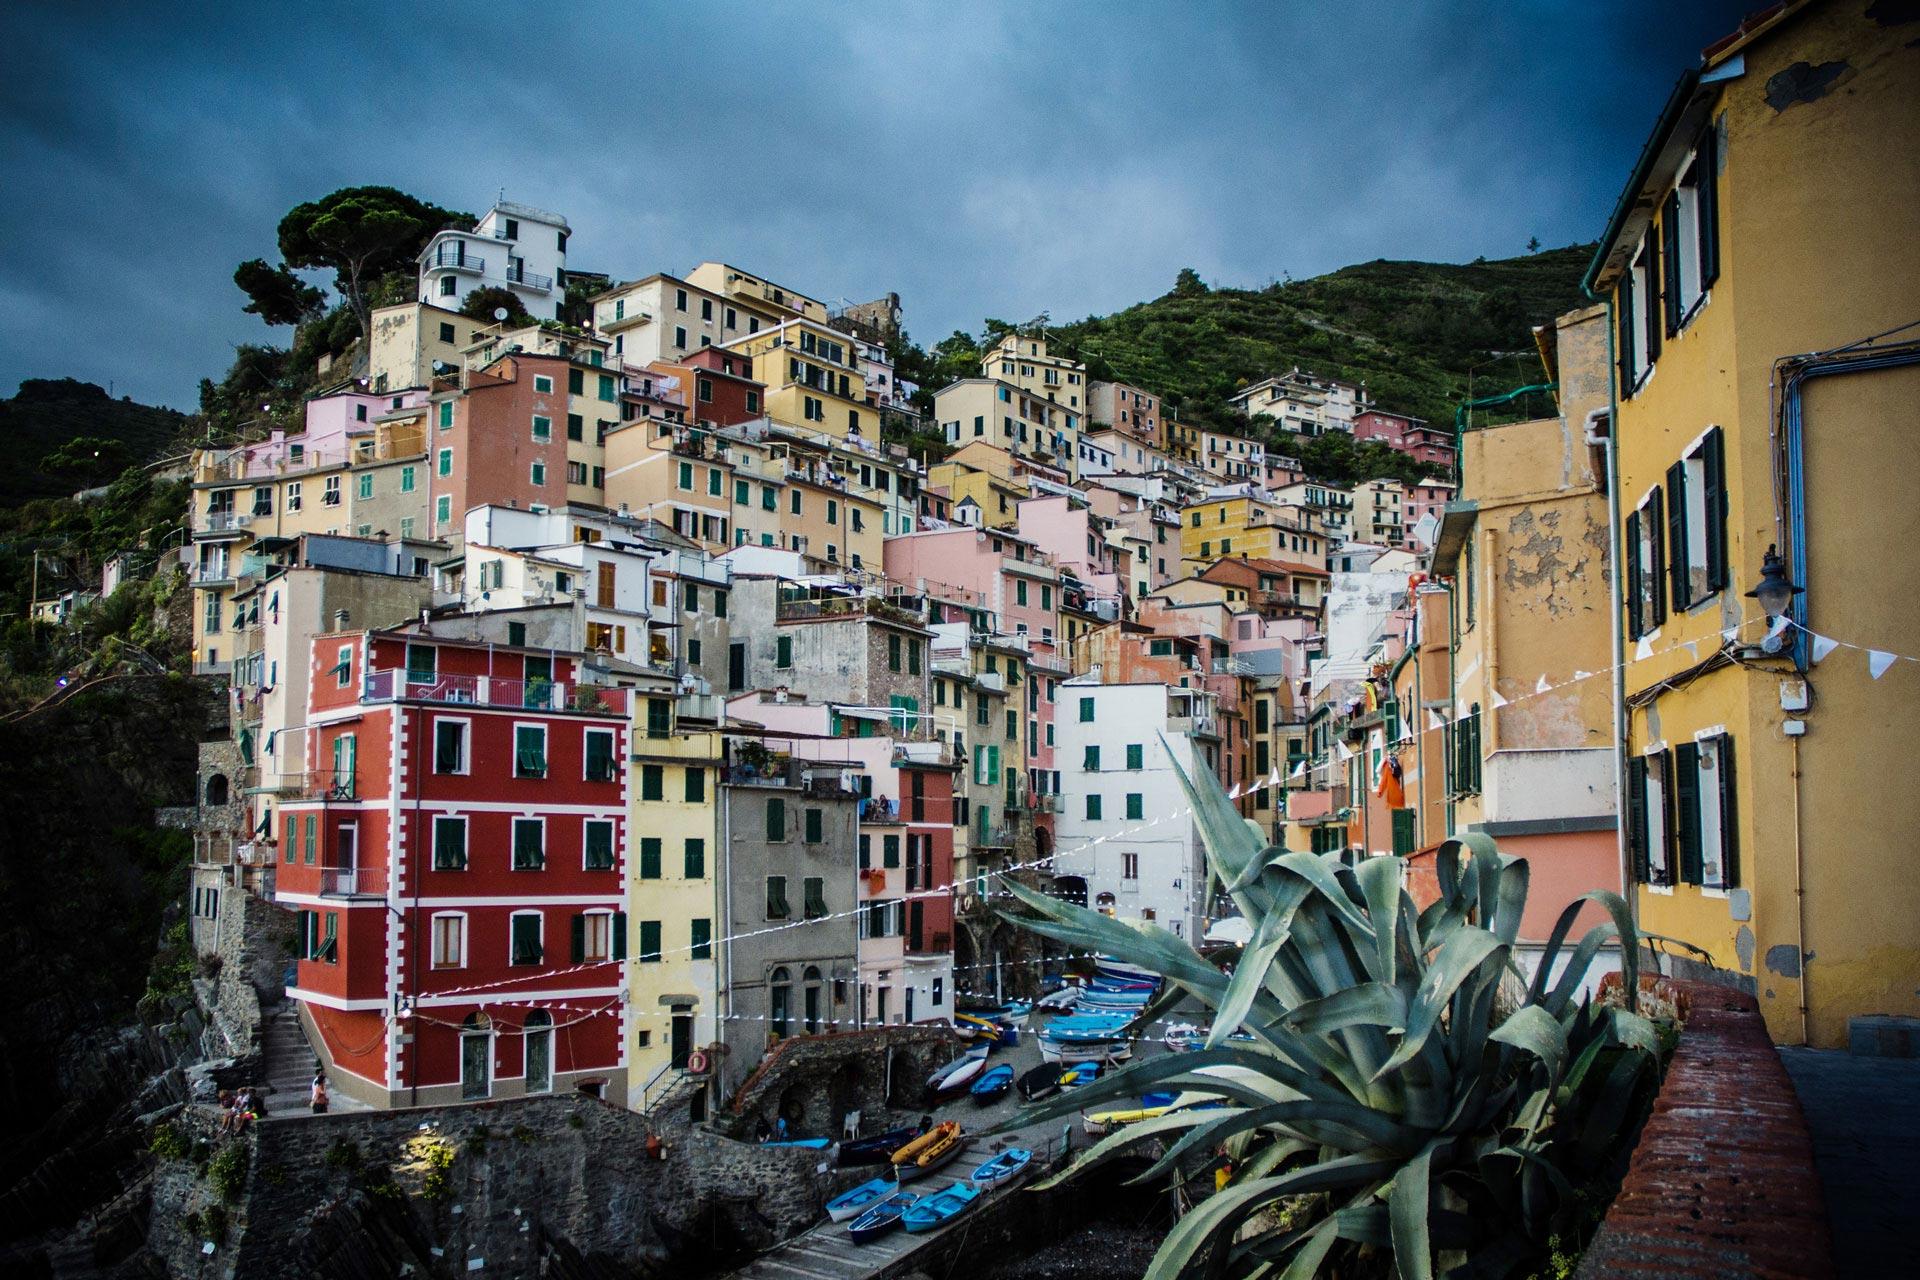 Fotografo di Paesaggi - 5 - Cinque Terre, Liguria, Italia - Cinque Terre, Liguria, Italia